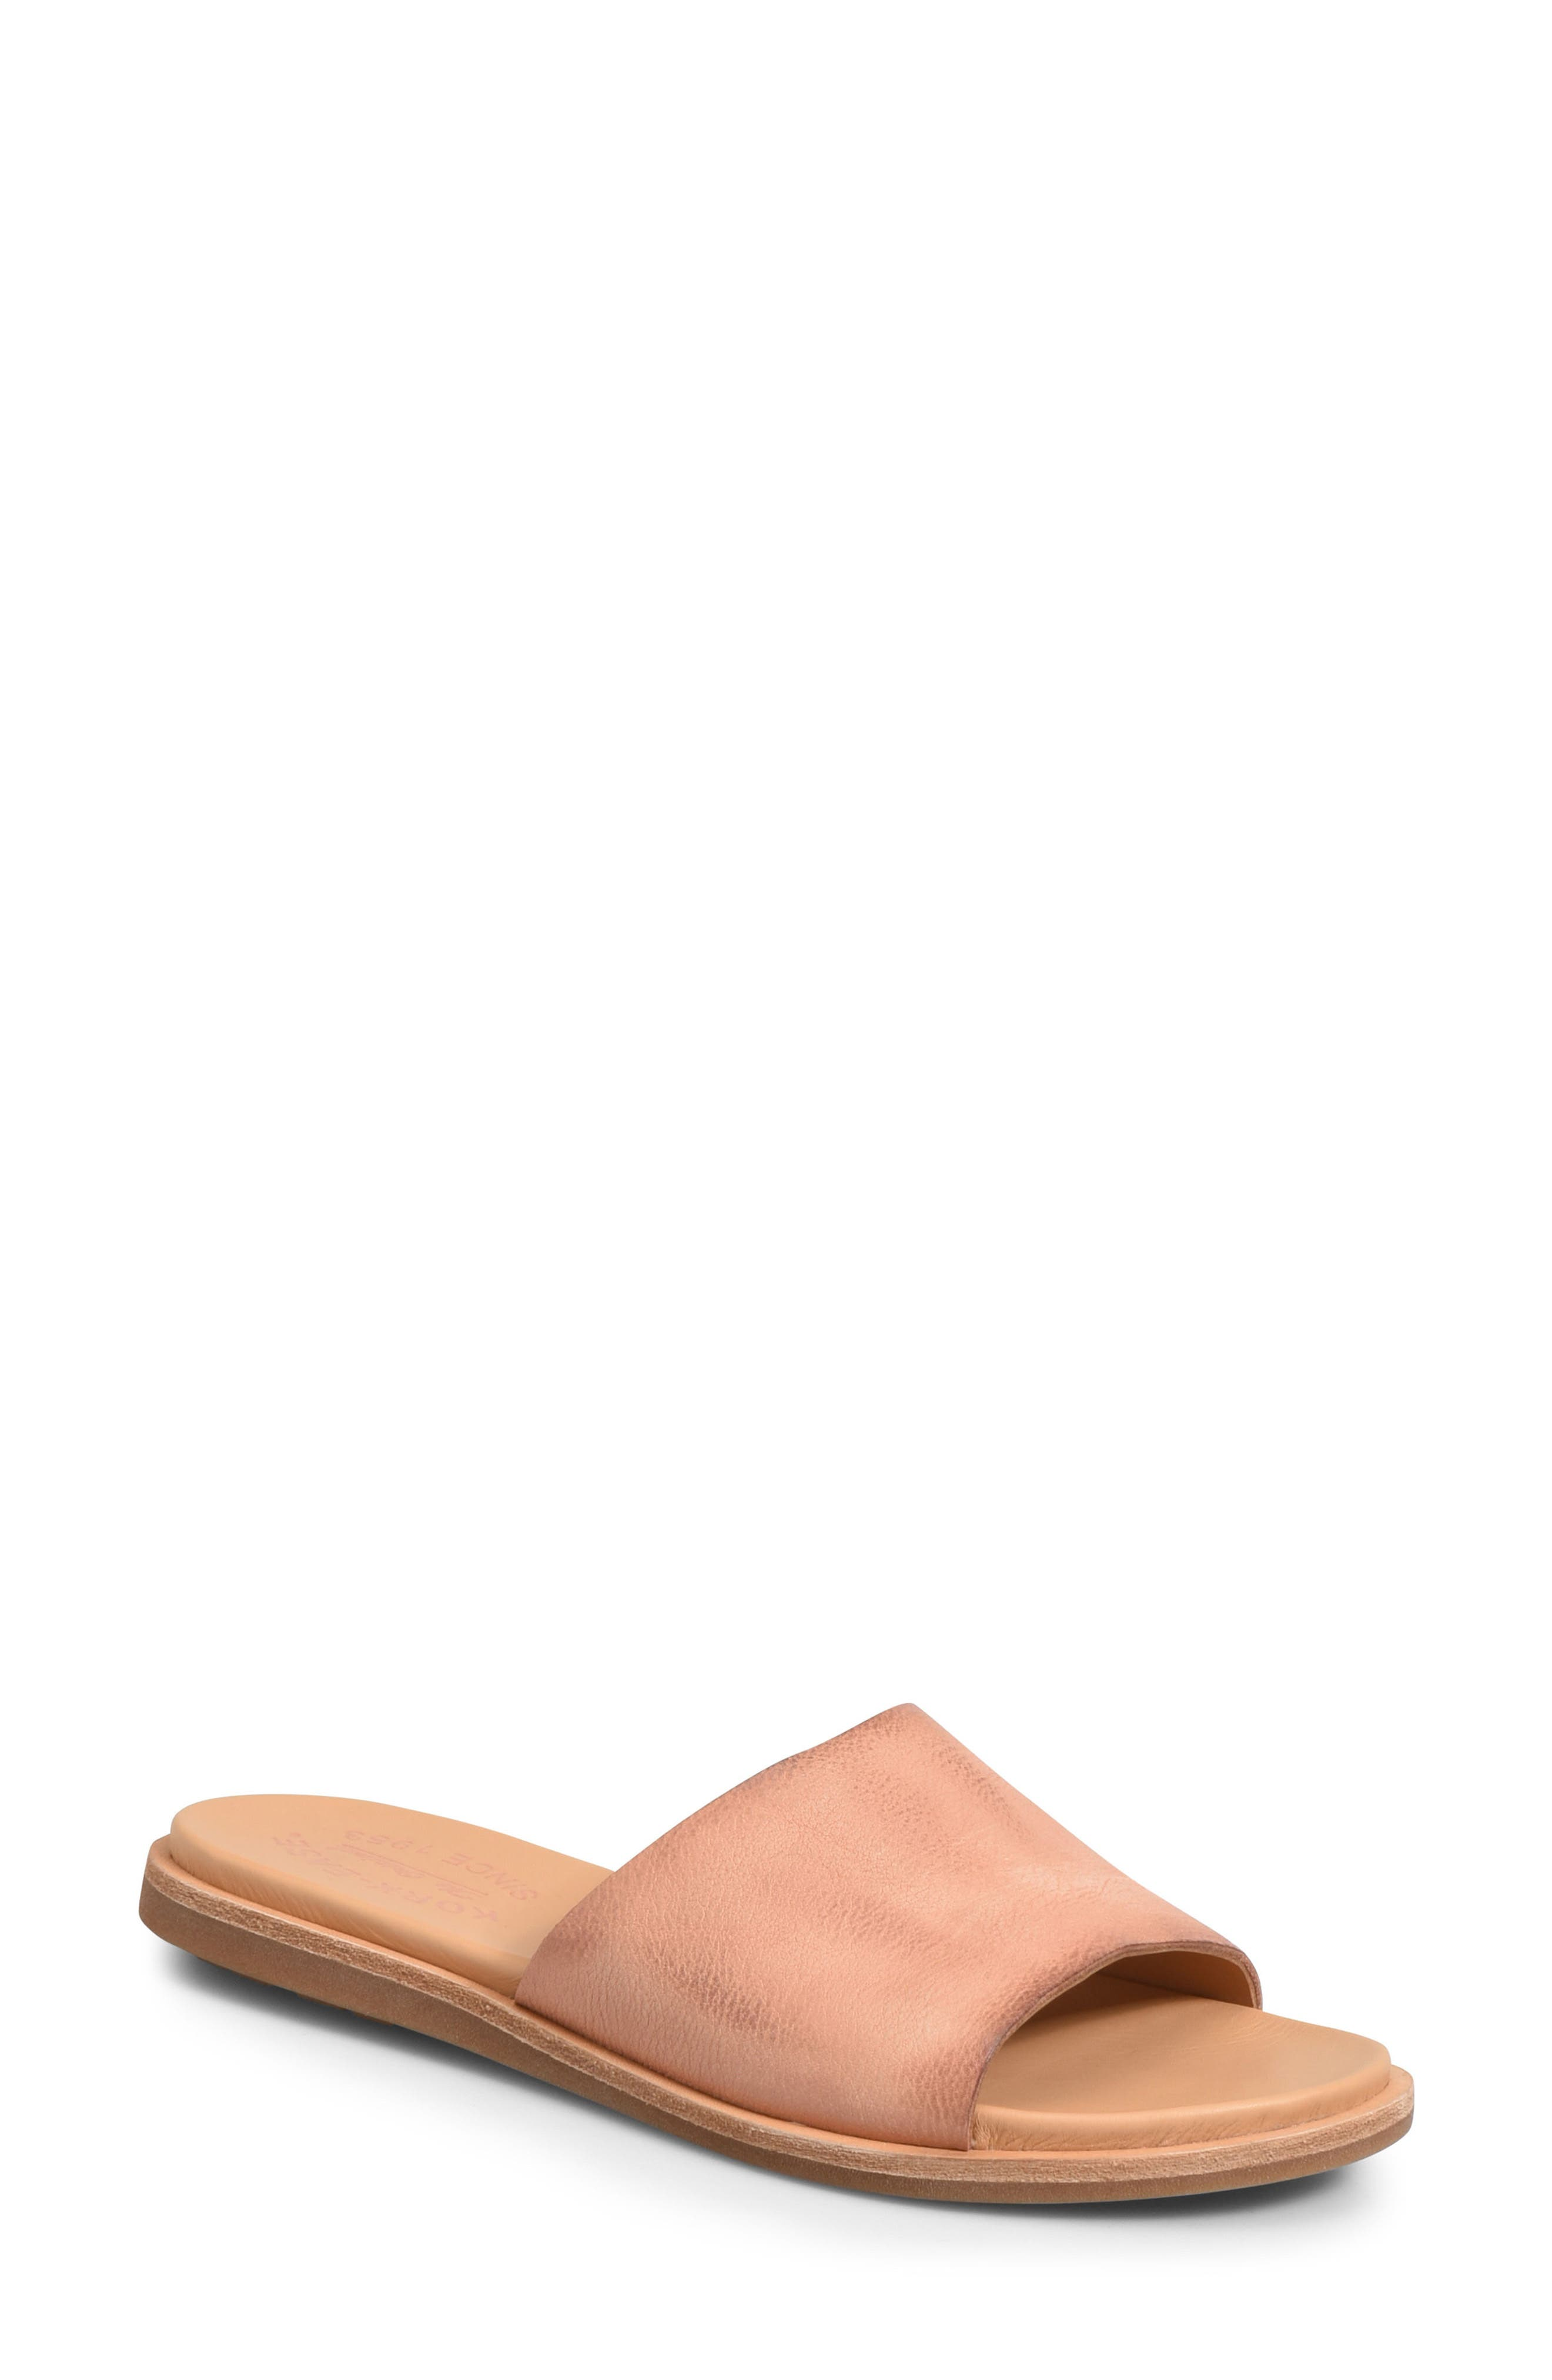 Gila Slide Sandal,                         Main,                         color, Blush Leather